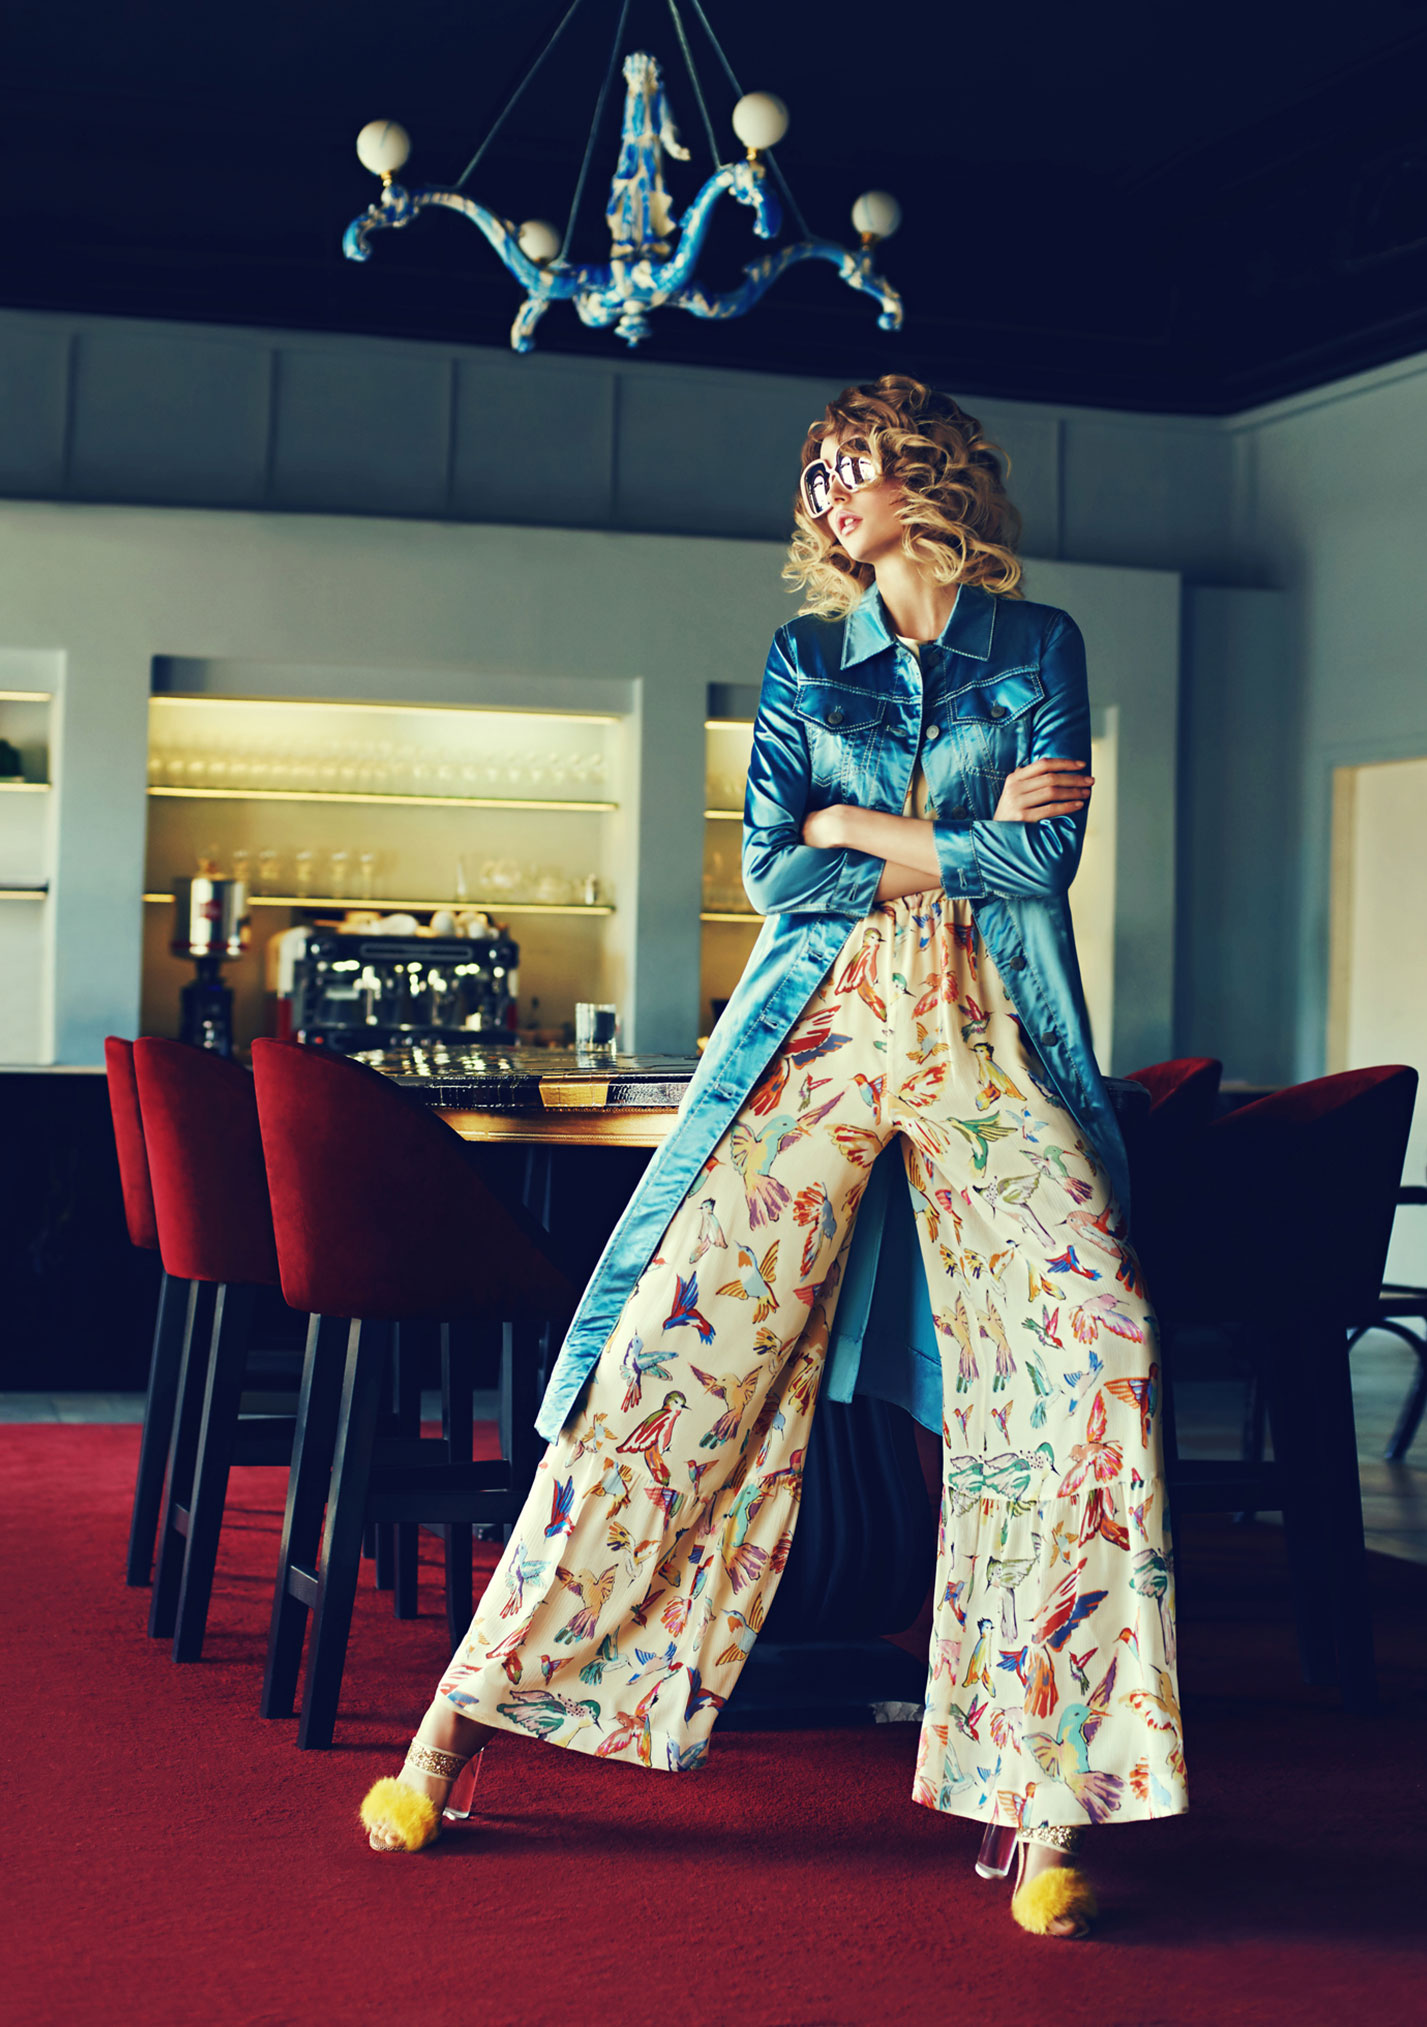 Антонина Ермолина в рекламной кампании модного бренда Au Pont Rouge, весна-лето 2017 / фото 09